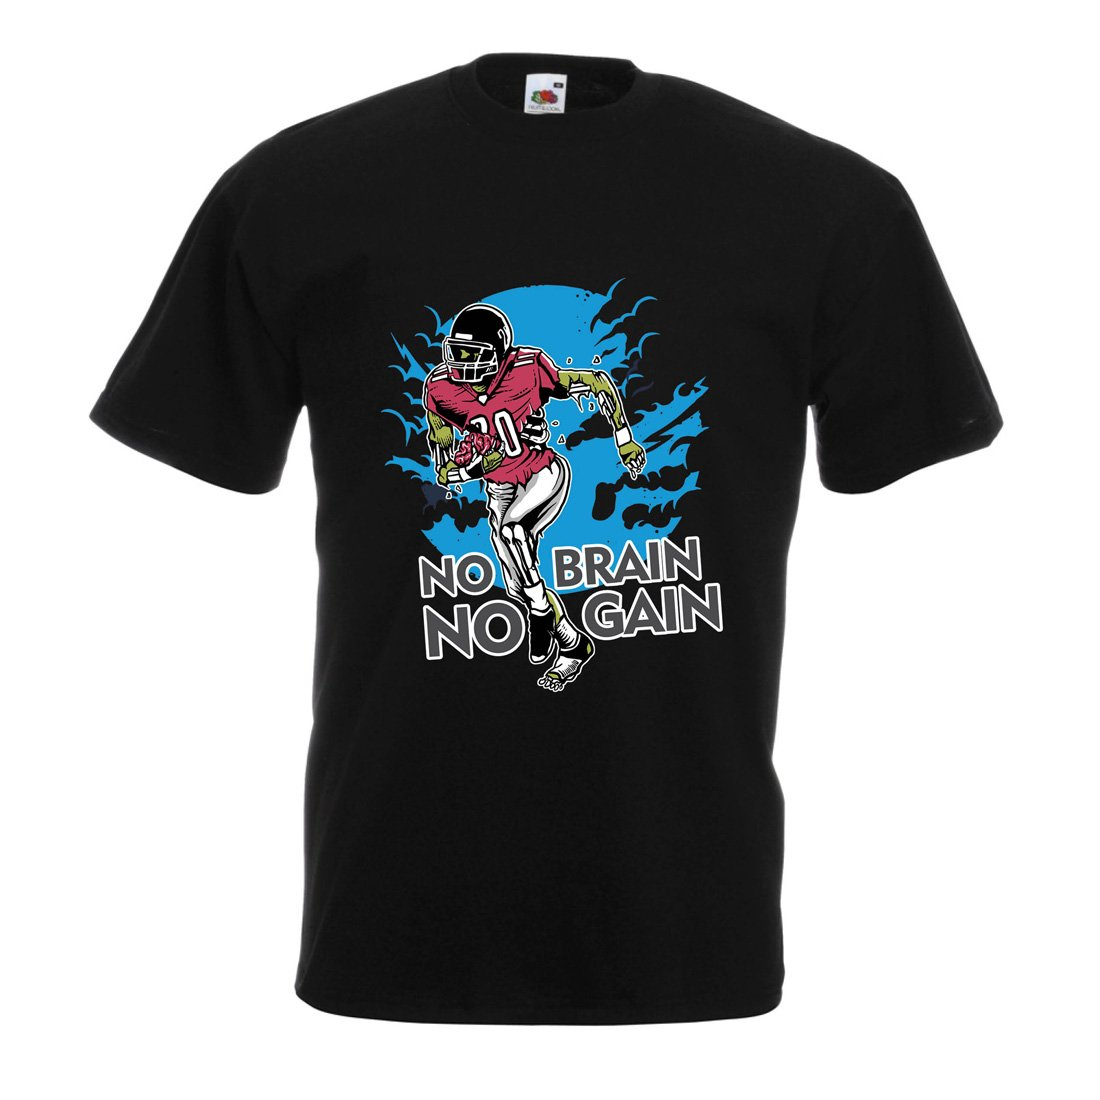 Zombie Football Player lepni.me Shirts for Men No Brain No Gain Inspirational Football Quotes